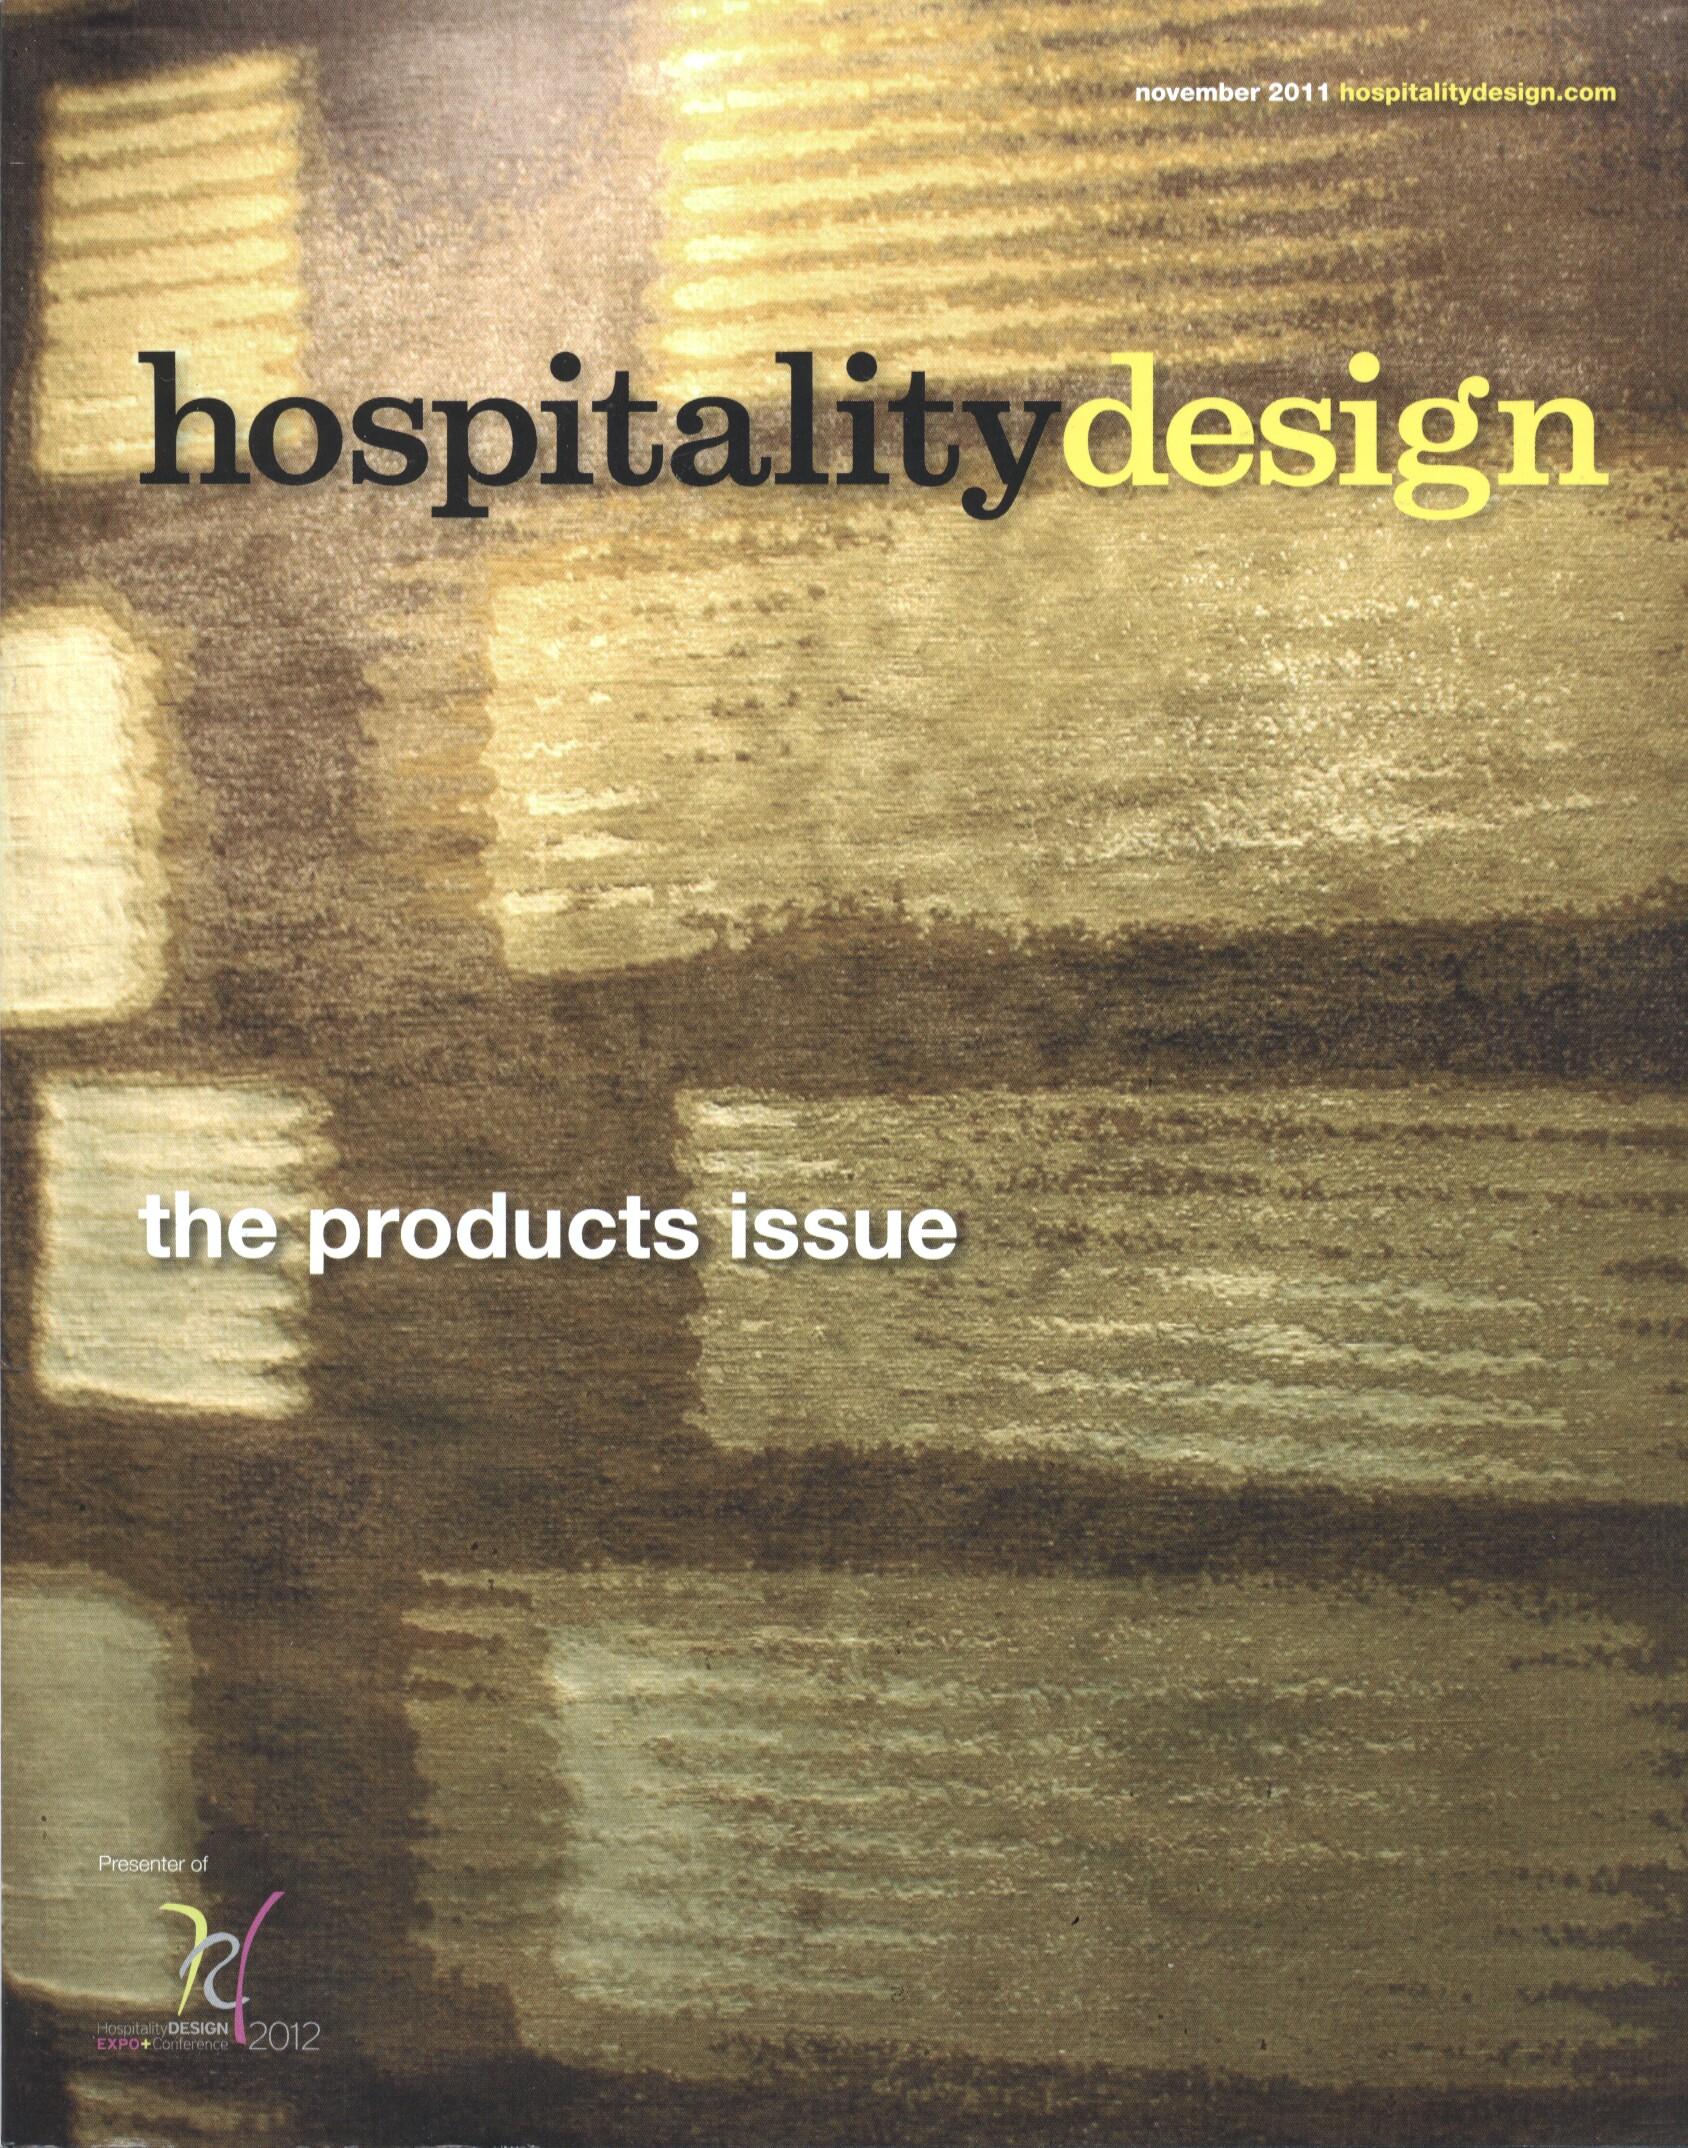 HOSPITALITY DESIGN, AUGUST 2011